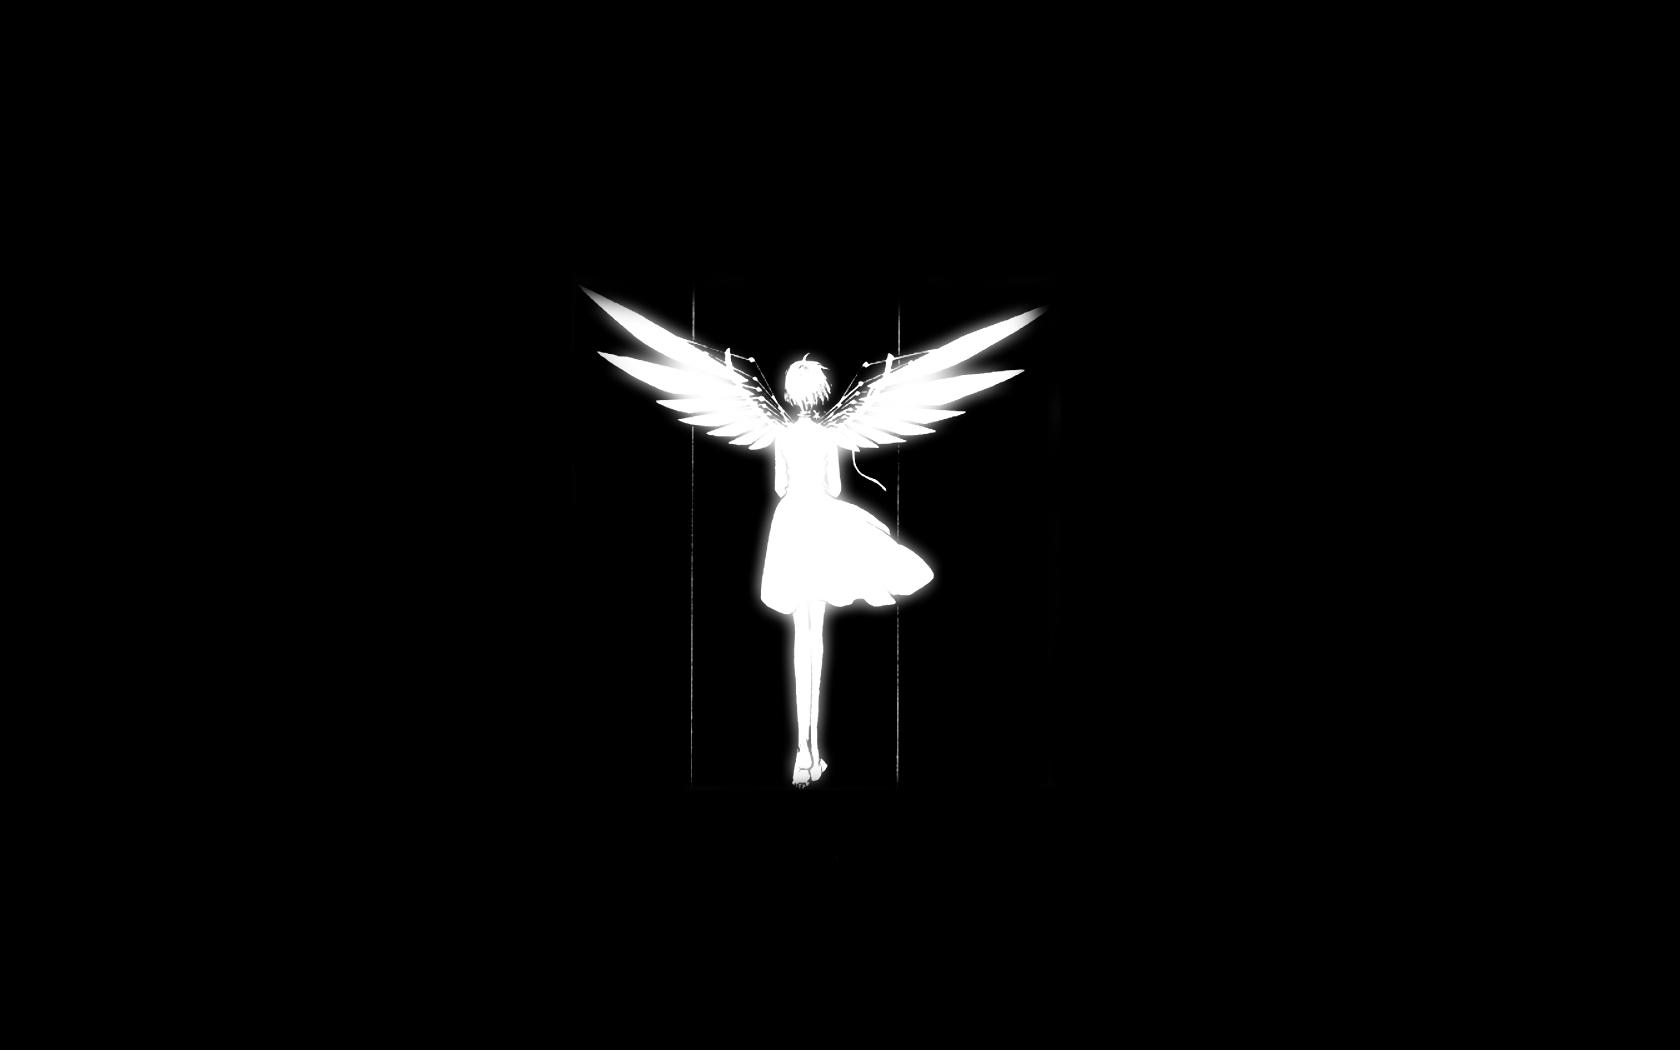 black clamp clover dark silhouette sue_(clover) wings